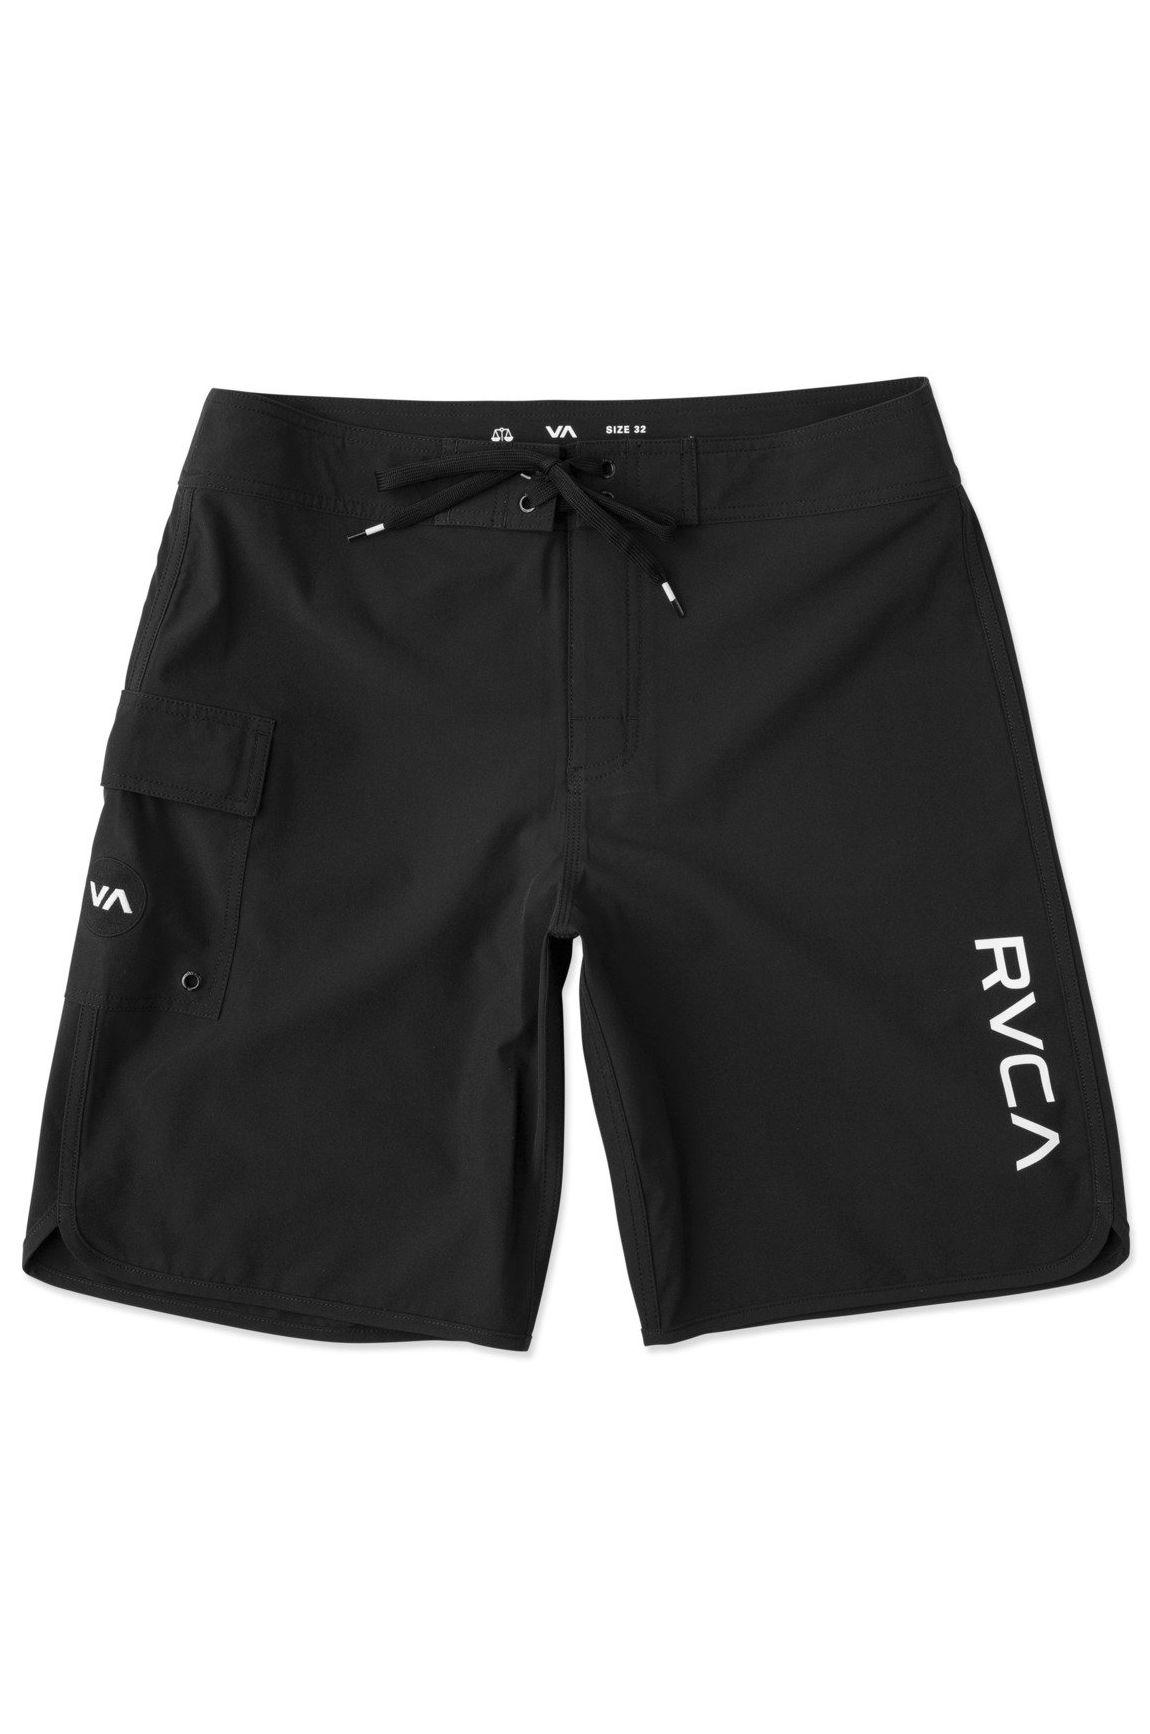 RVCA Boardshorts EASTERN 18 All Black